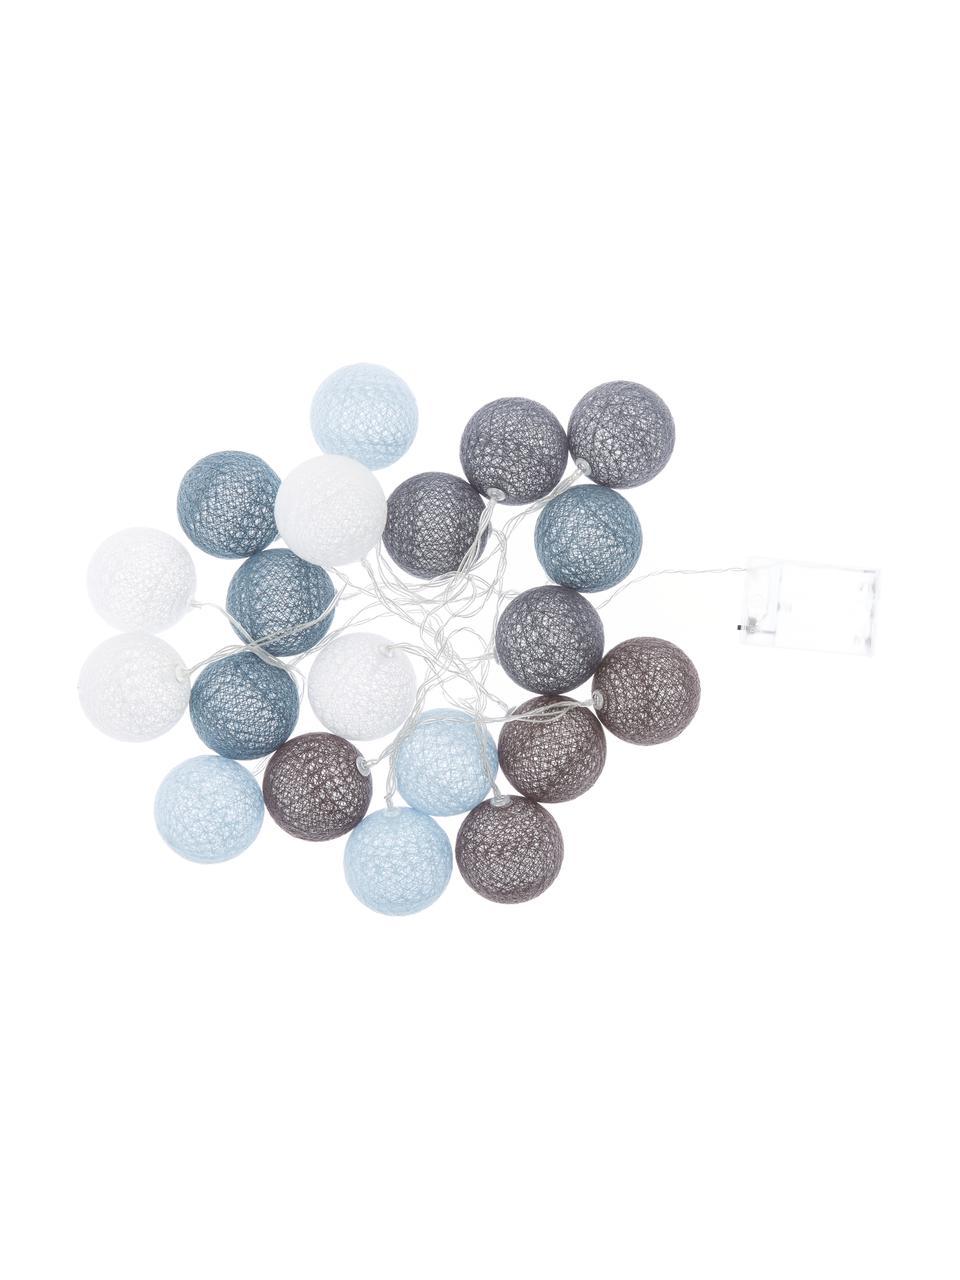 LED-Lichterkette Bellin, 320 cm, Lampions: Baumwolle, Blau, Hellblau, Dunkelblau, Weiß, L 320 cm